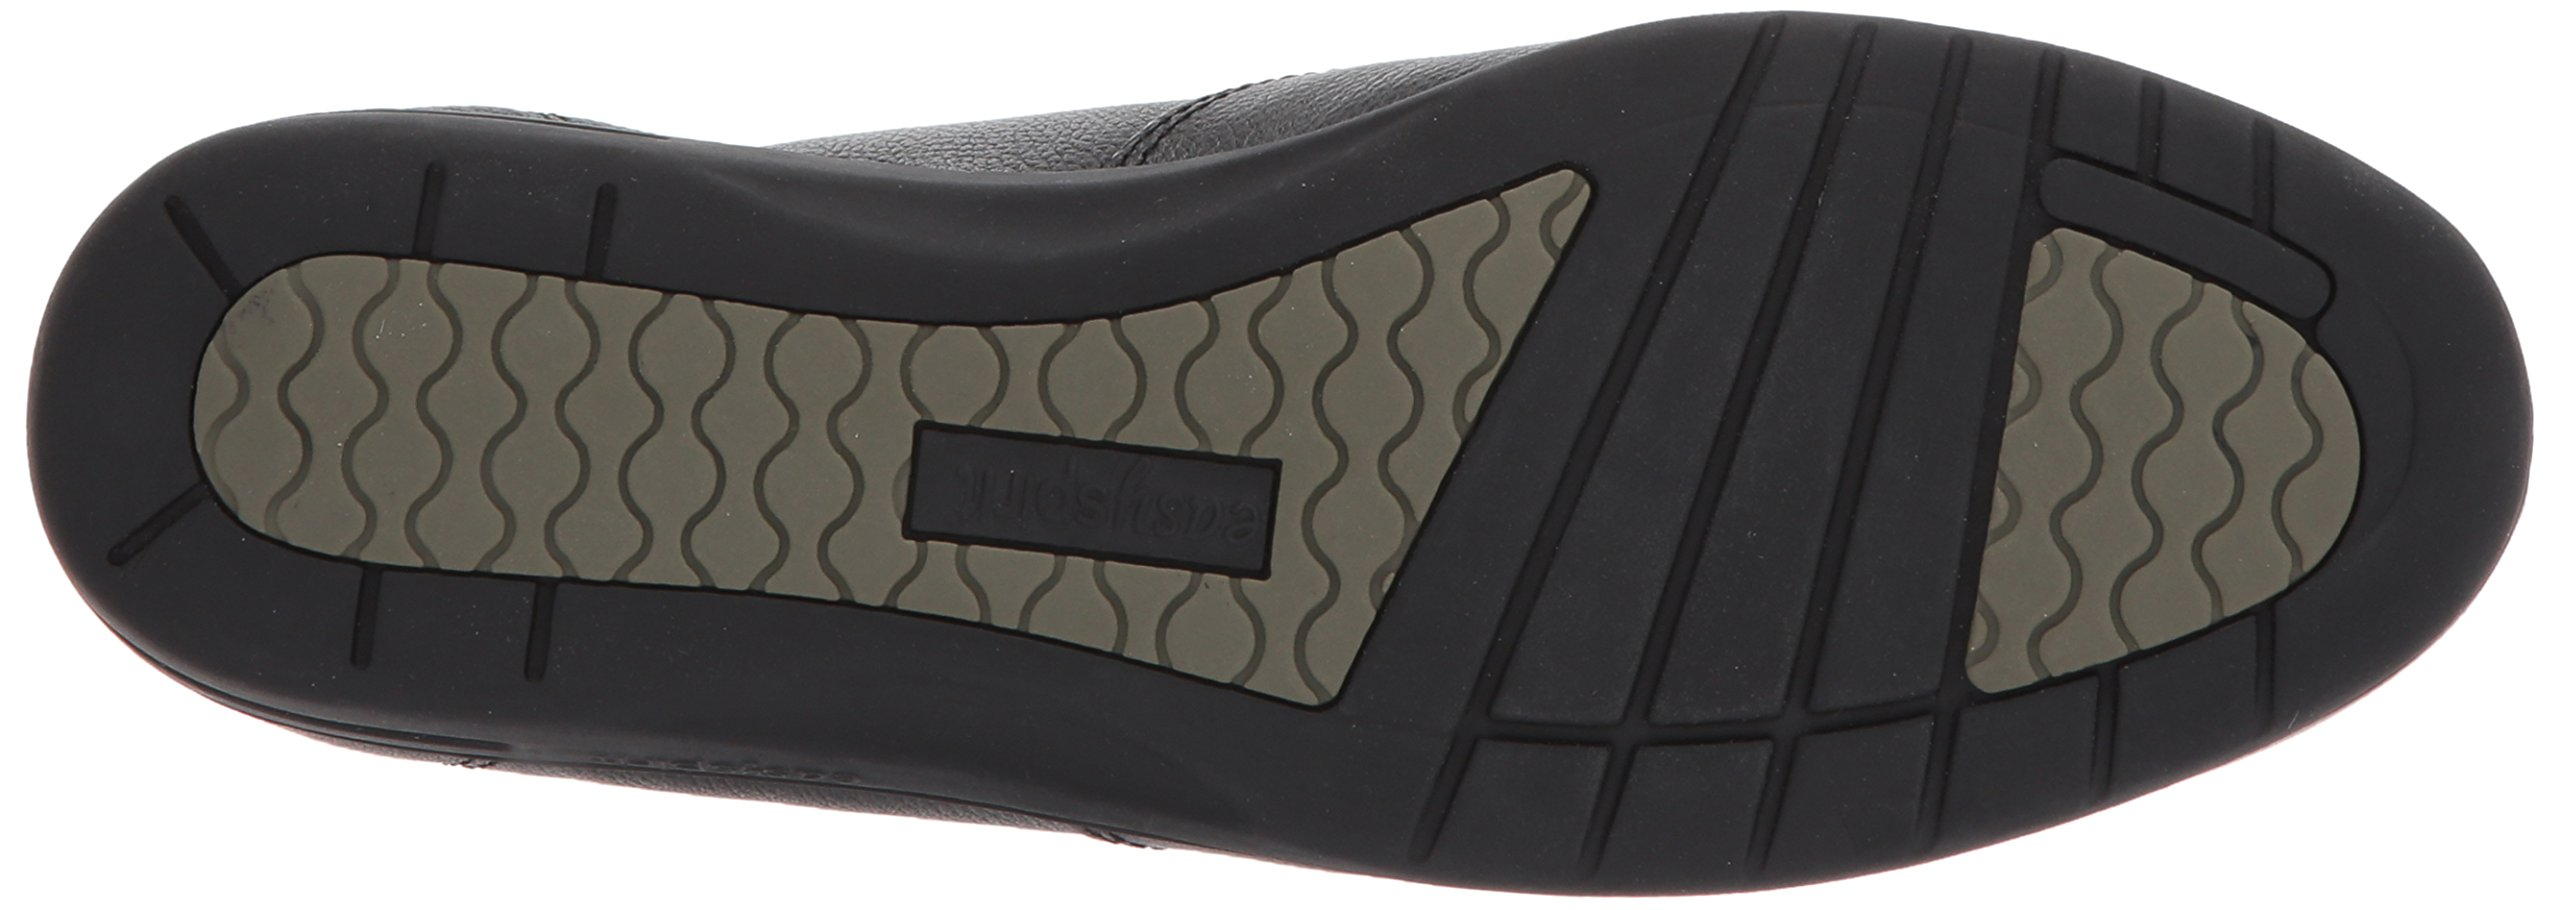 Easy Spirit Women's ESMOTION8 Shoe, black, 8.5 W US by Easy Spirit (Image #3)